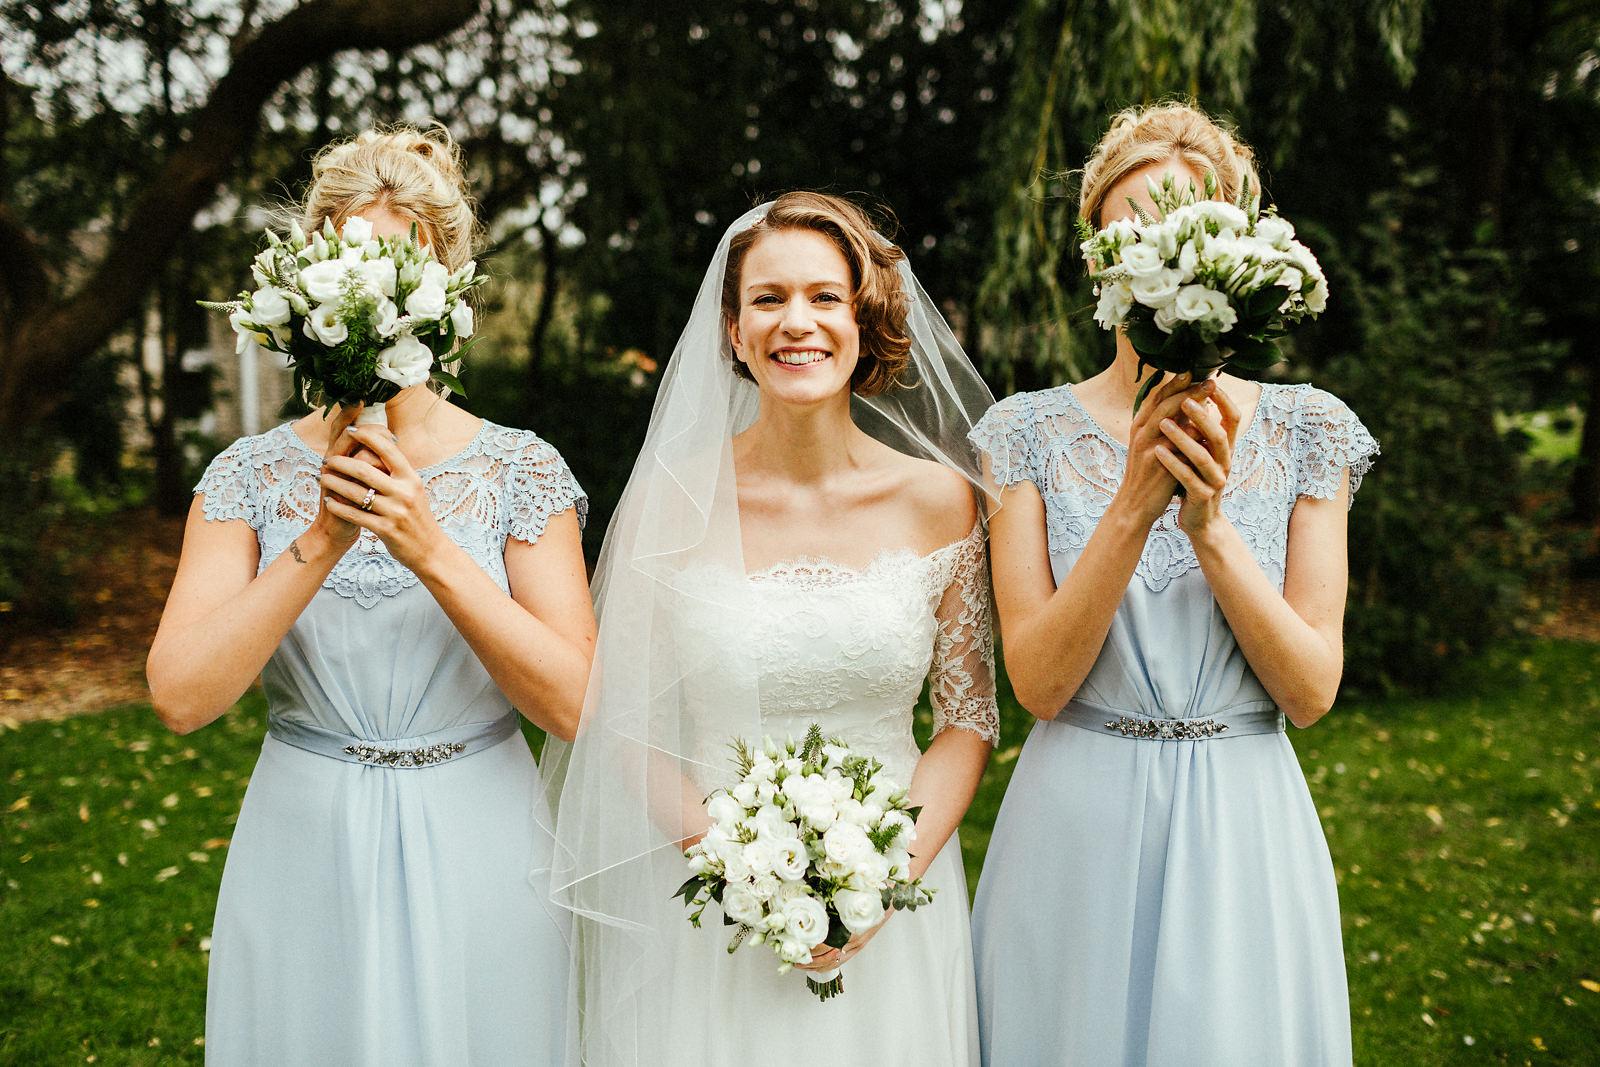 Kings Langley wedding group photos